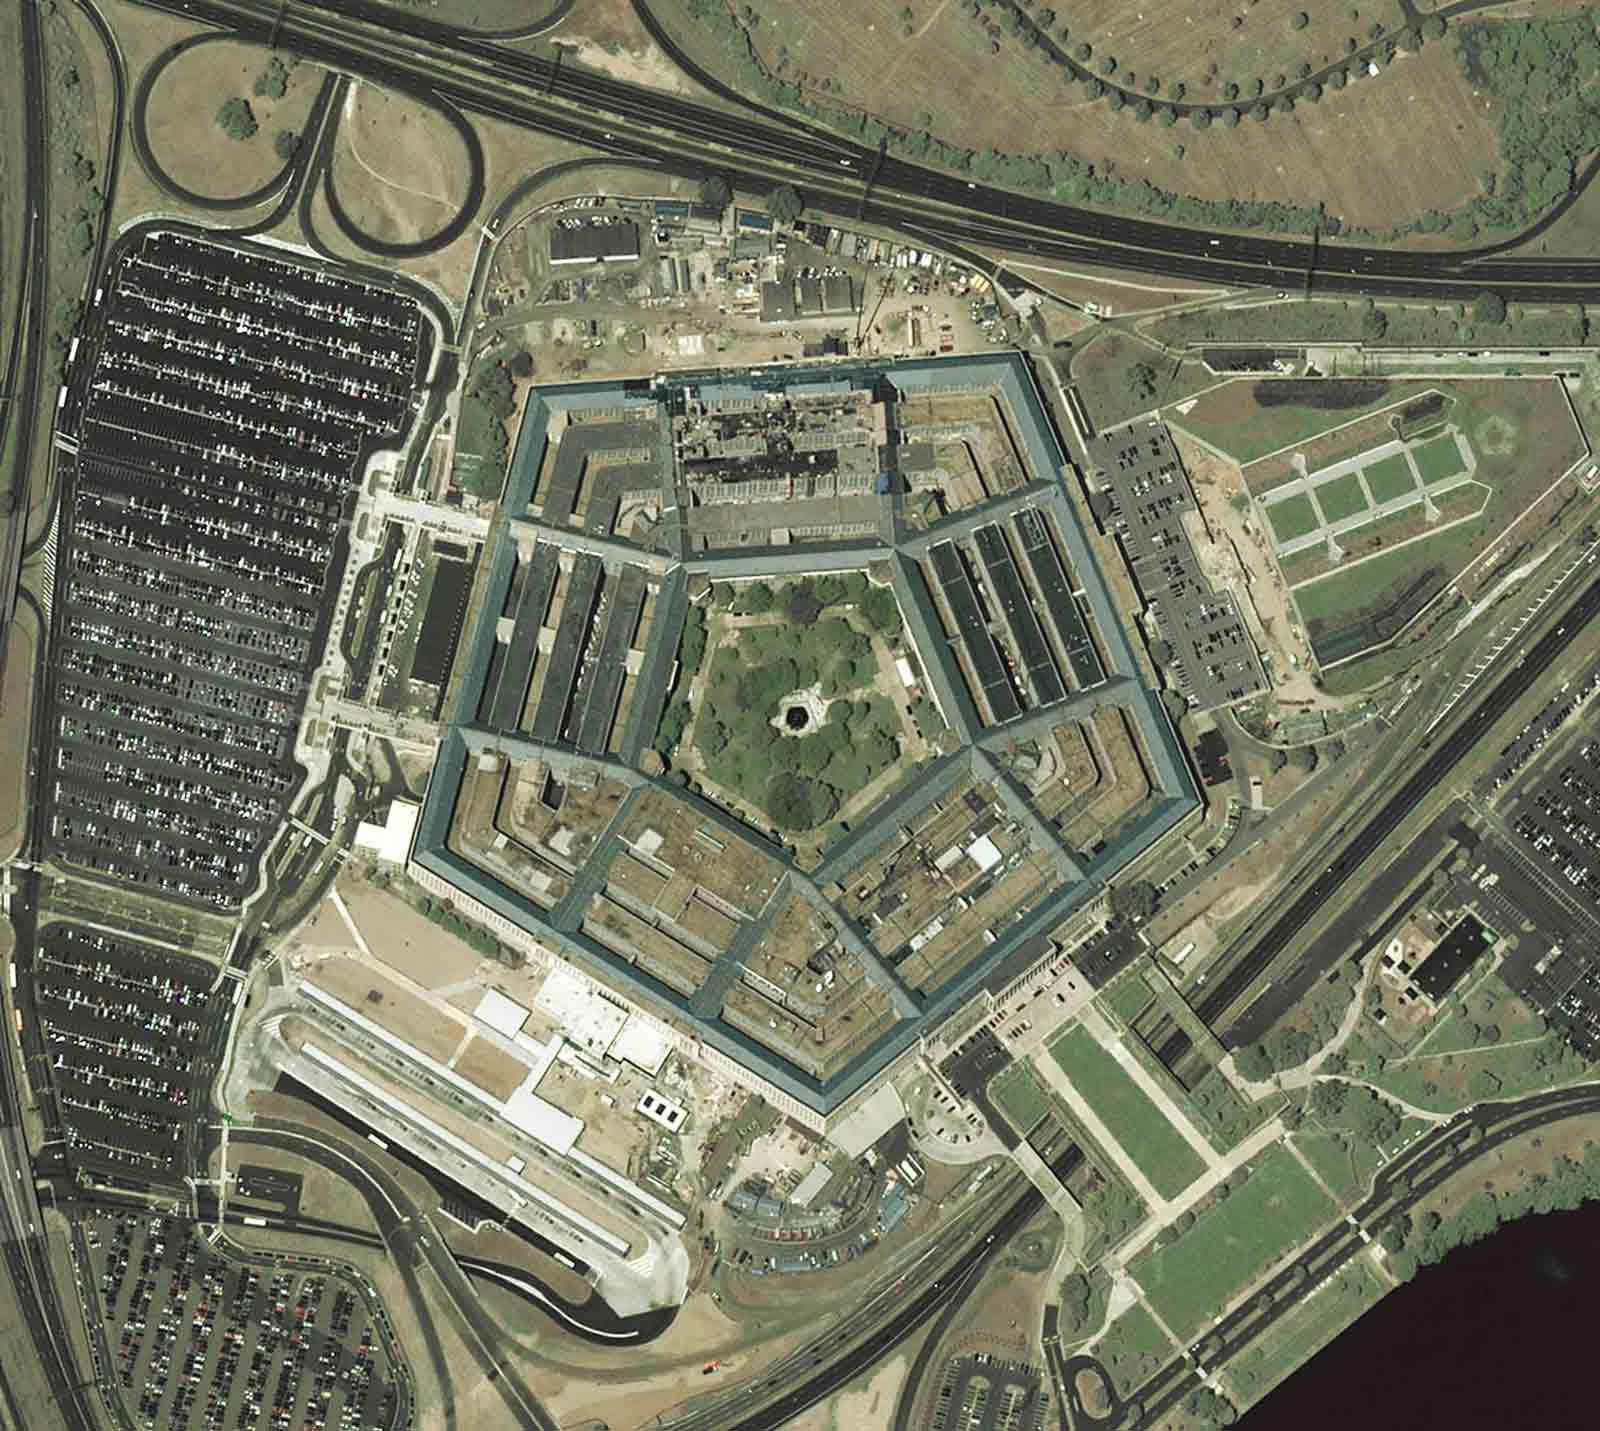 A satellite image of the Pentagon, Washington, D.C., August 2, 2002